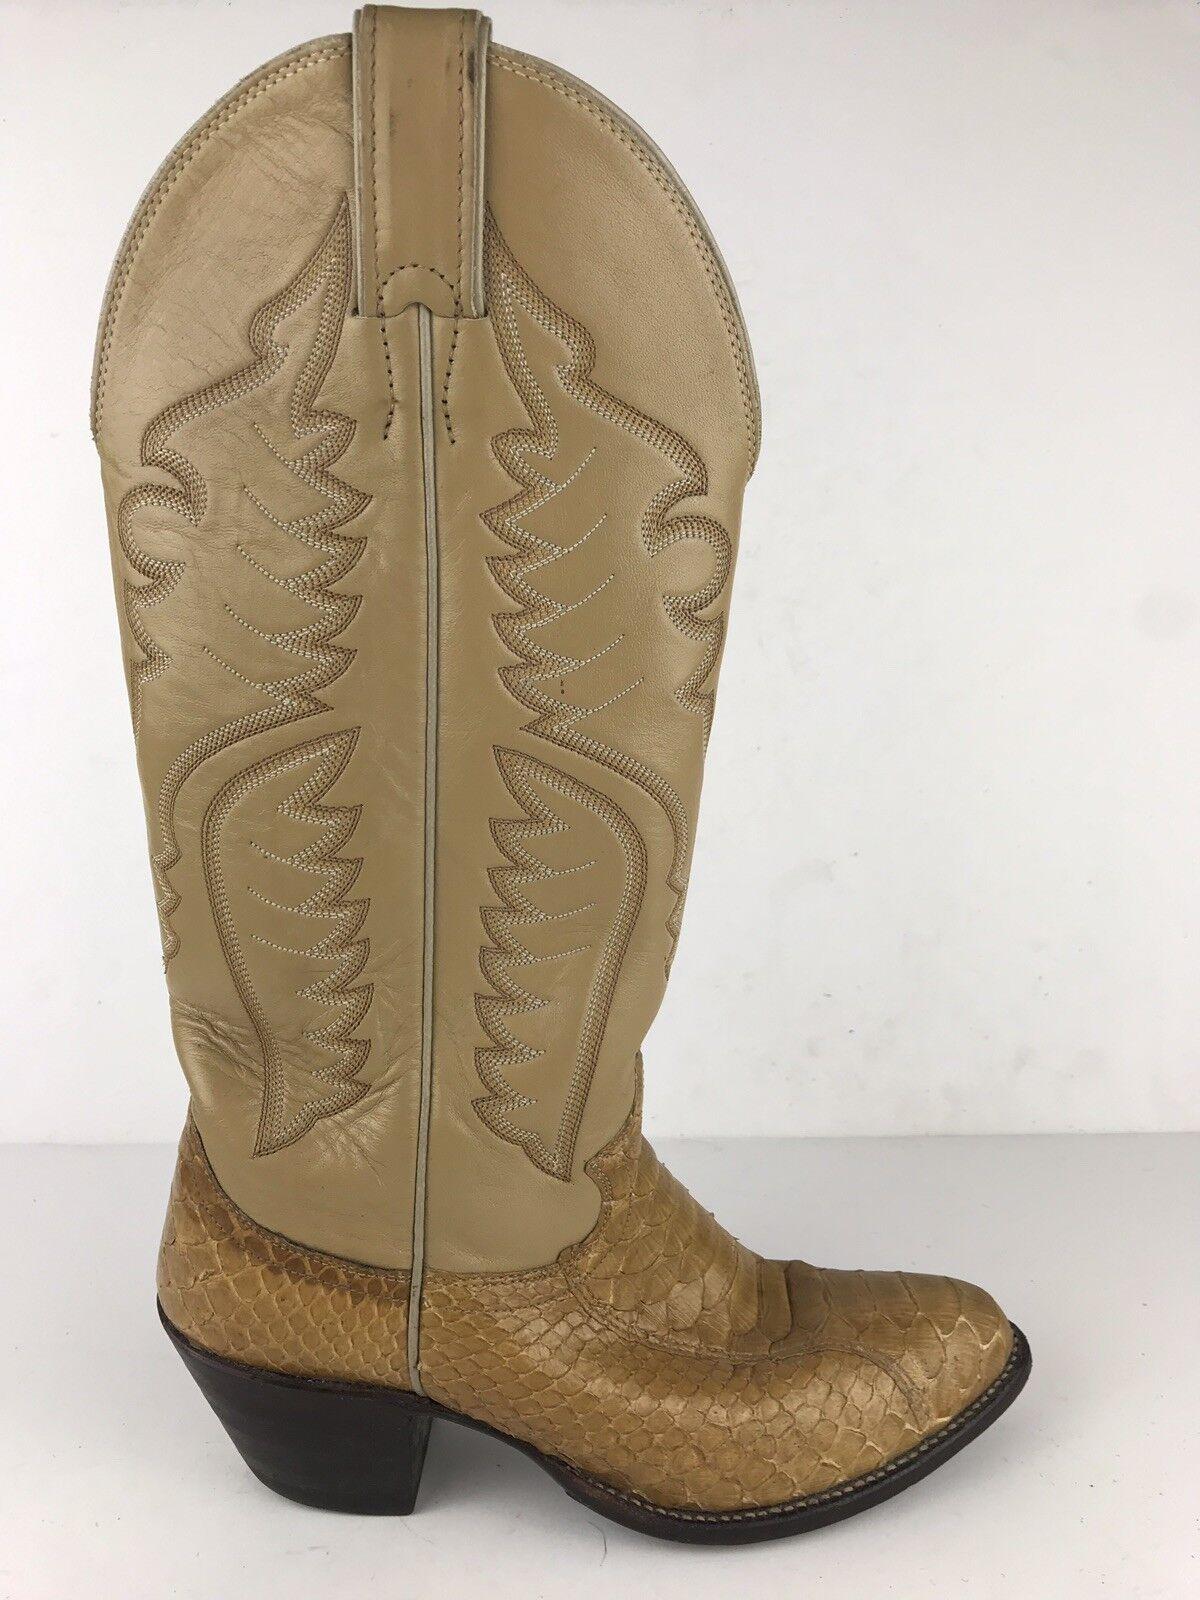 Justin stivali Wouomo 6.5 B Python Snake Skin Leather Coloree Blonde Cowboy Western